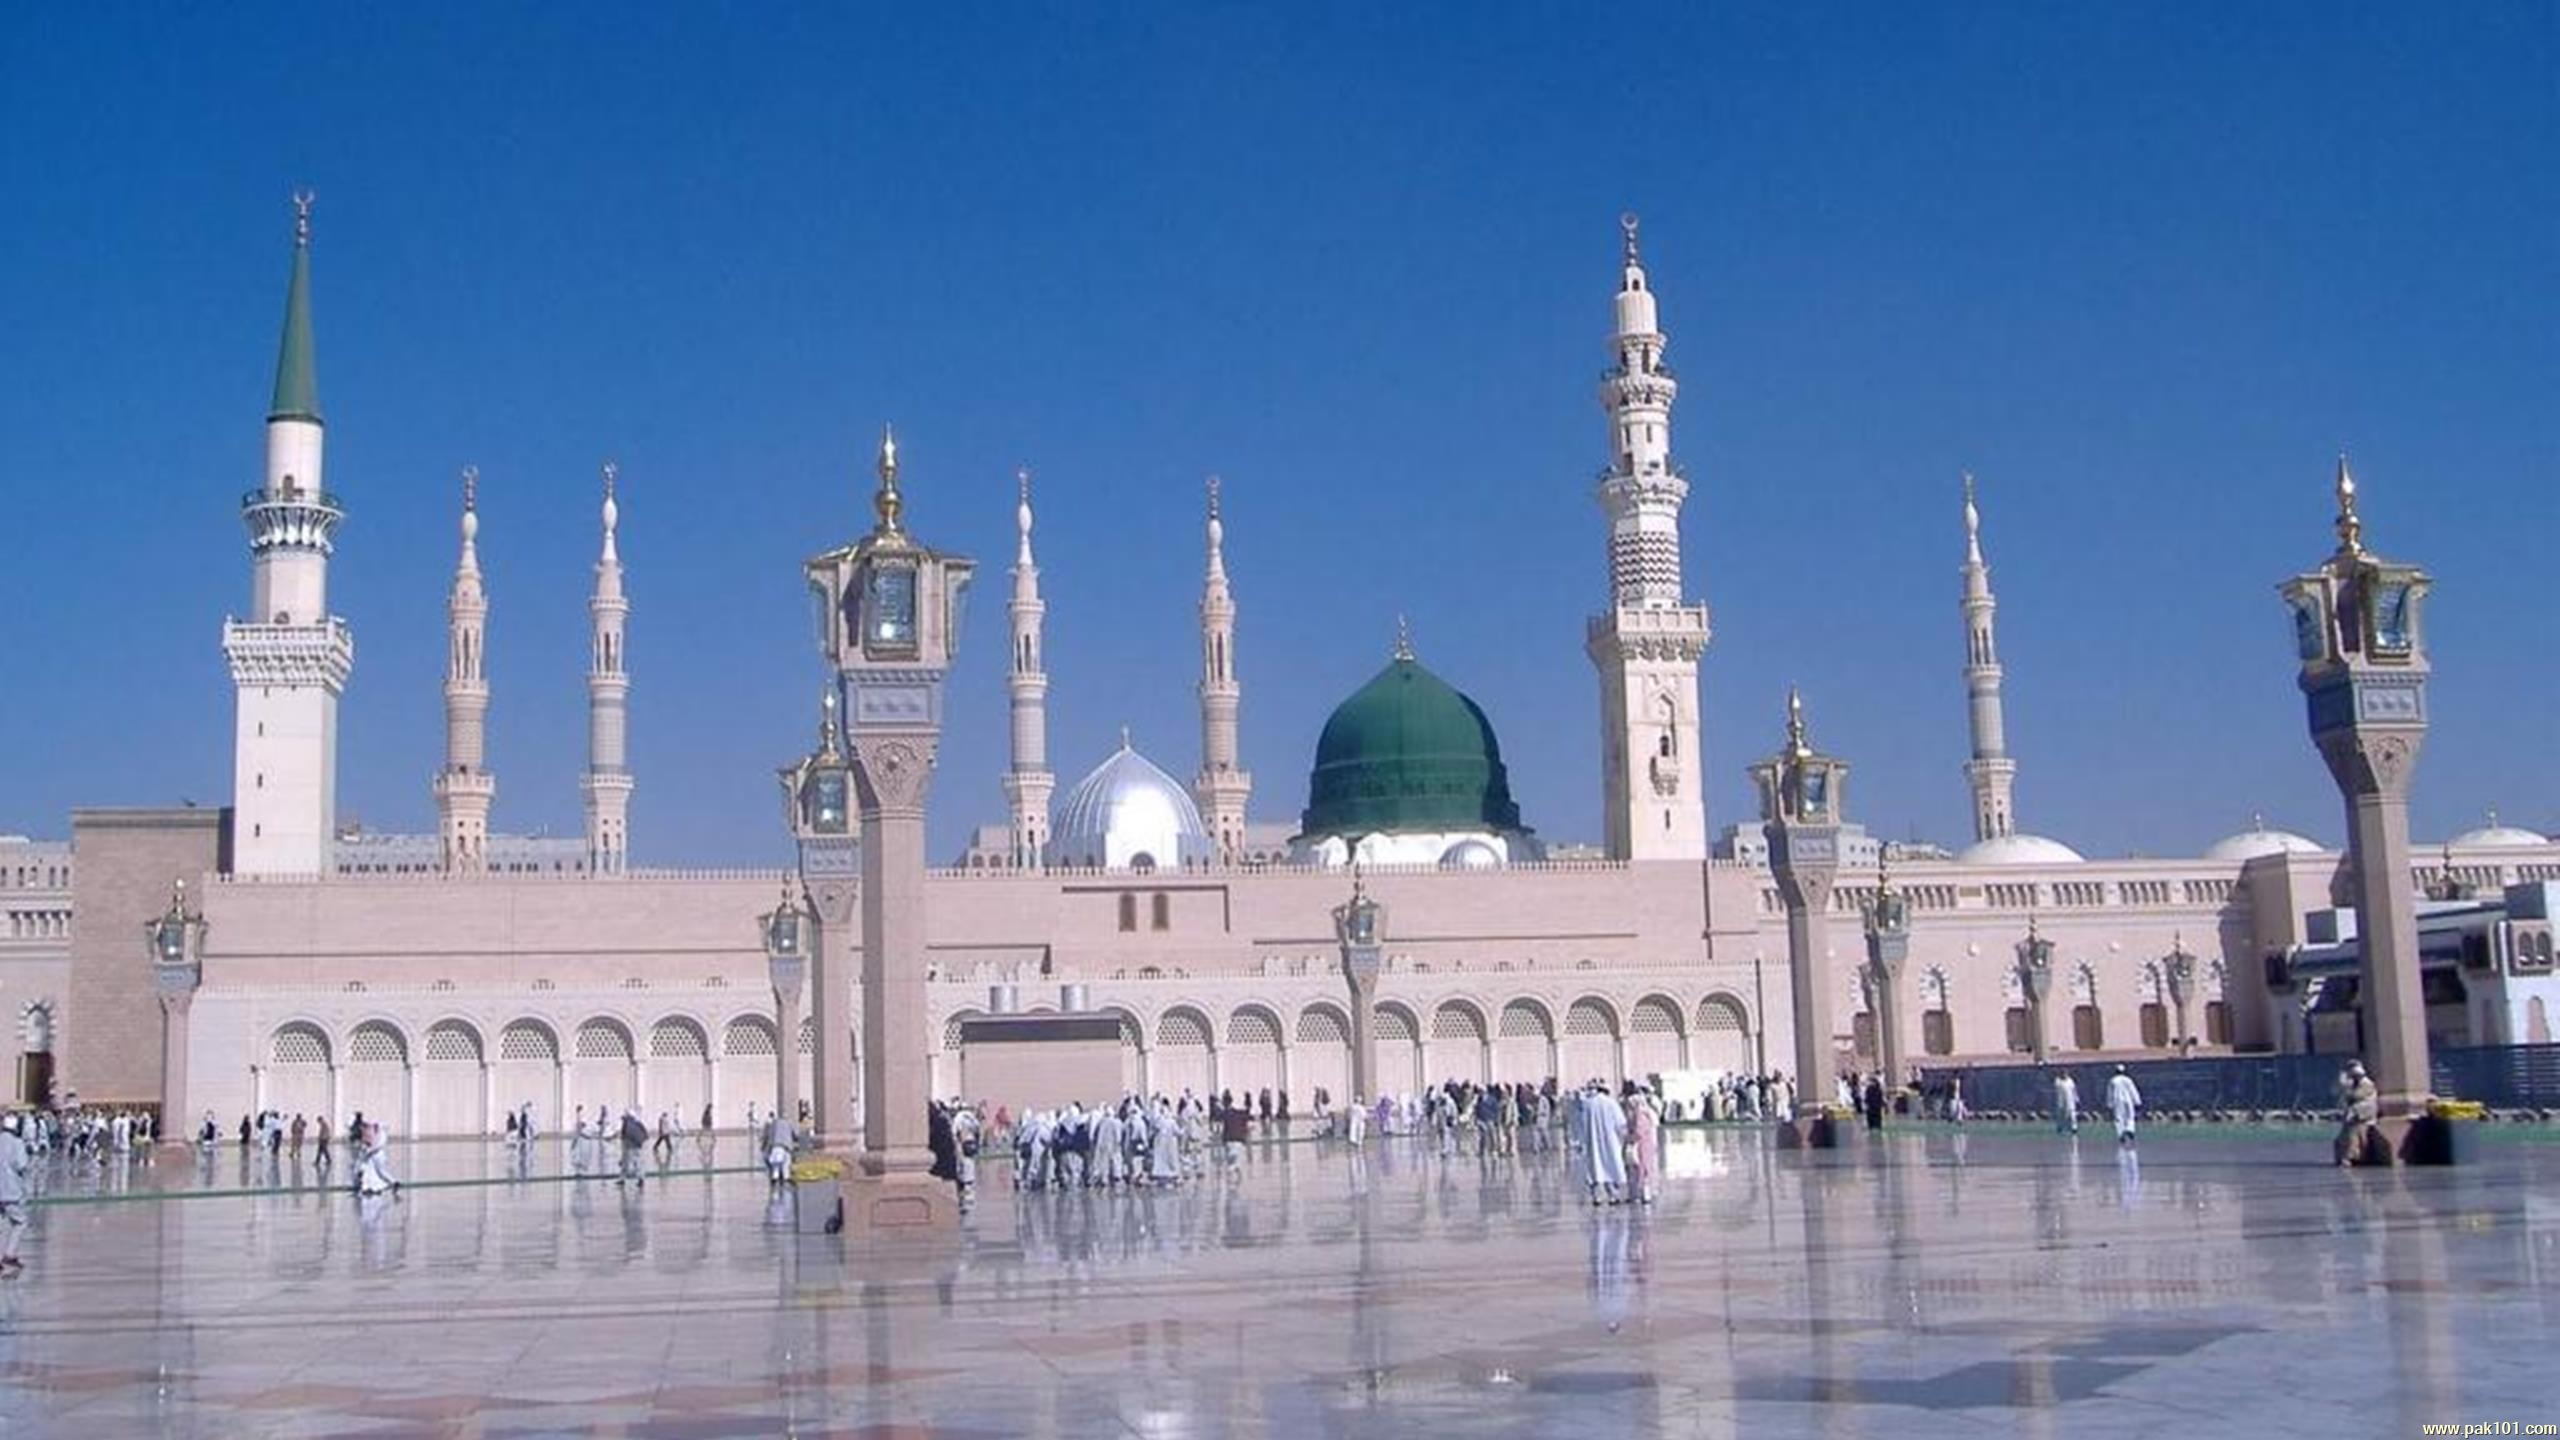 Al Masjid an Nabawi